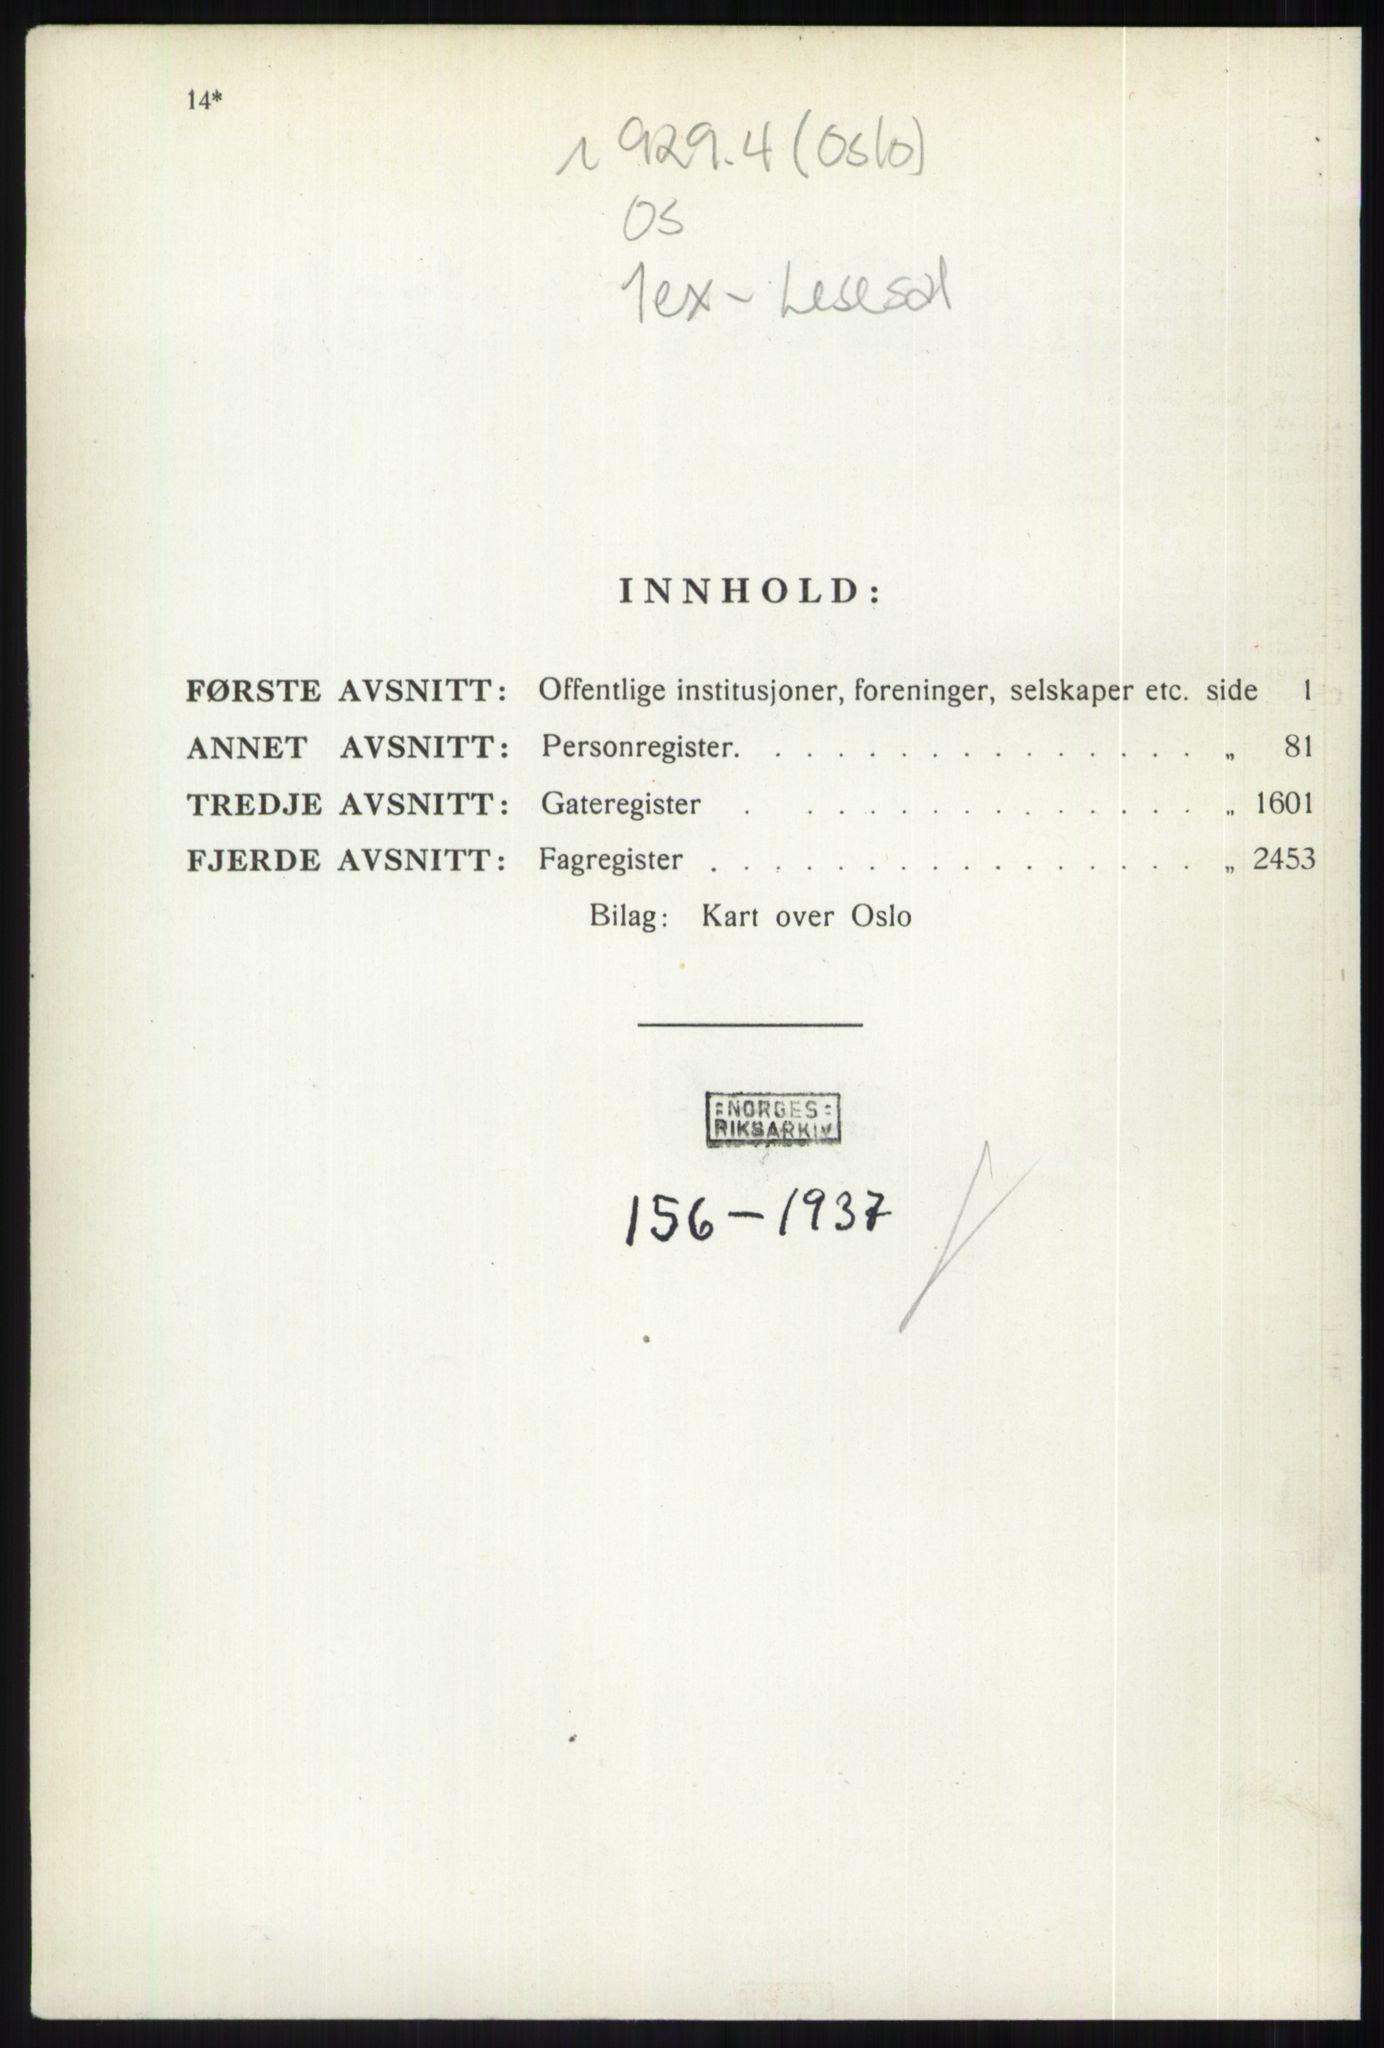 PUBL, Kristiania/Oslo adressebok, 1937